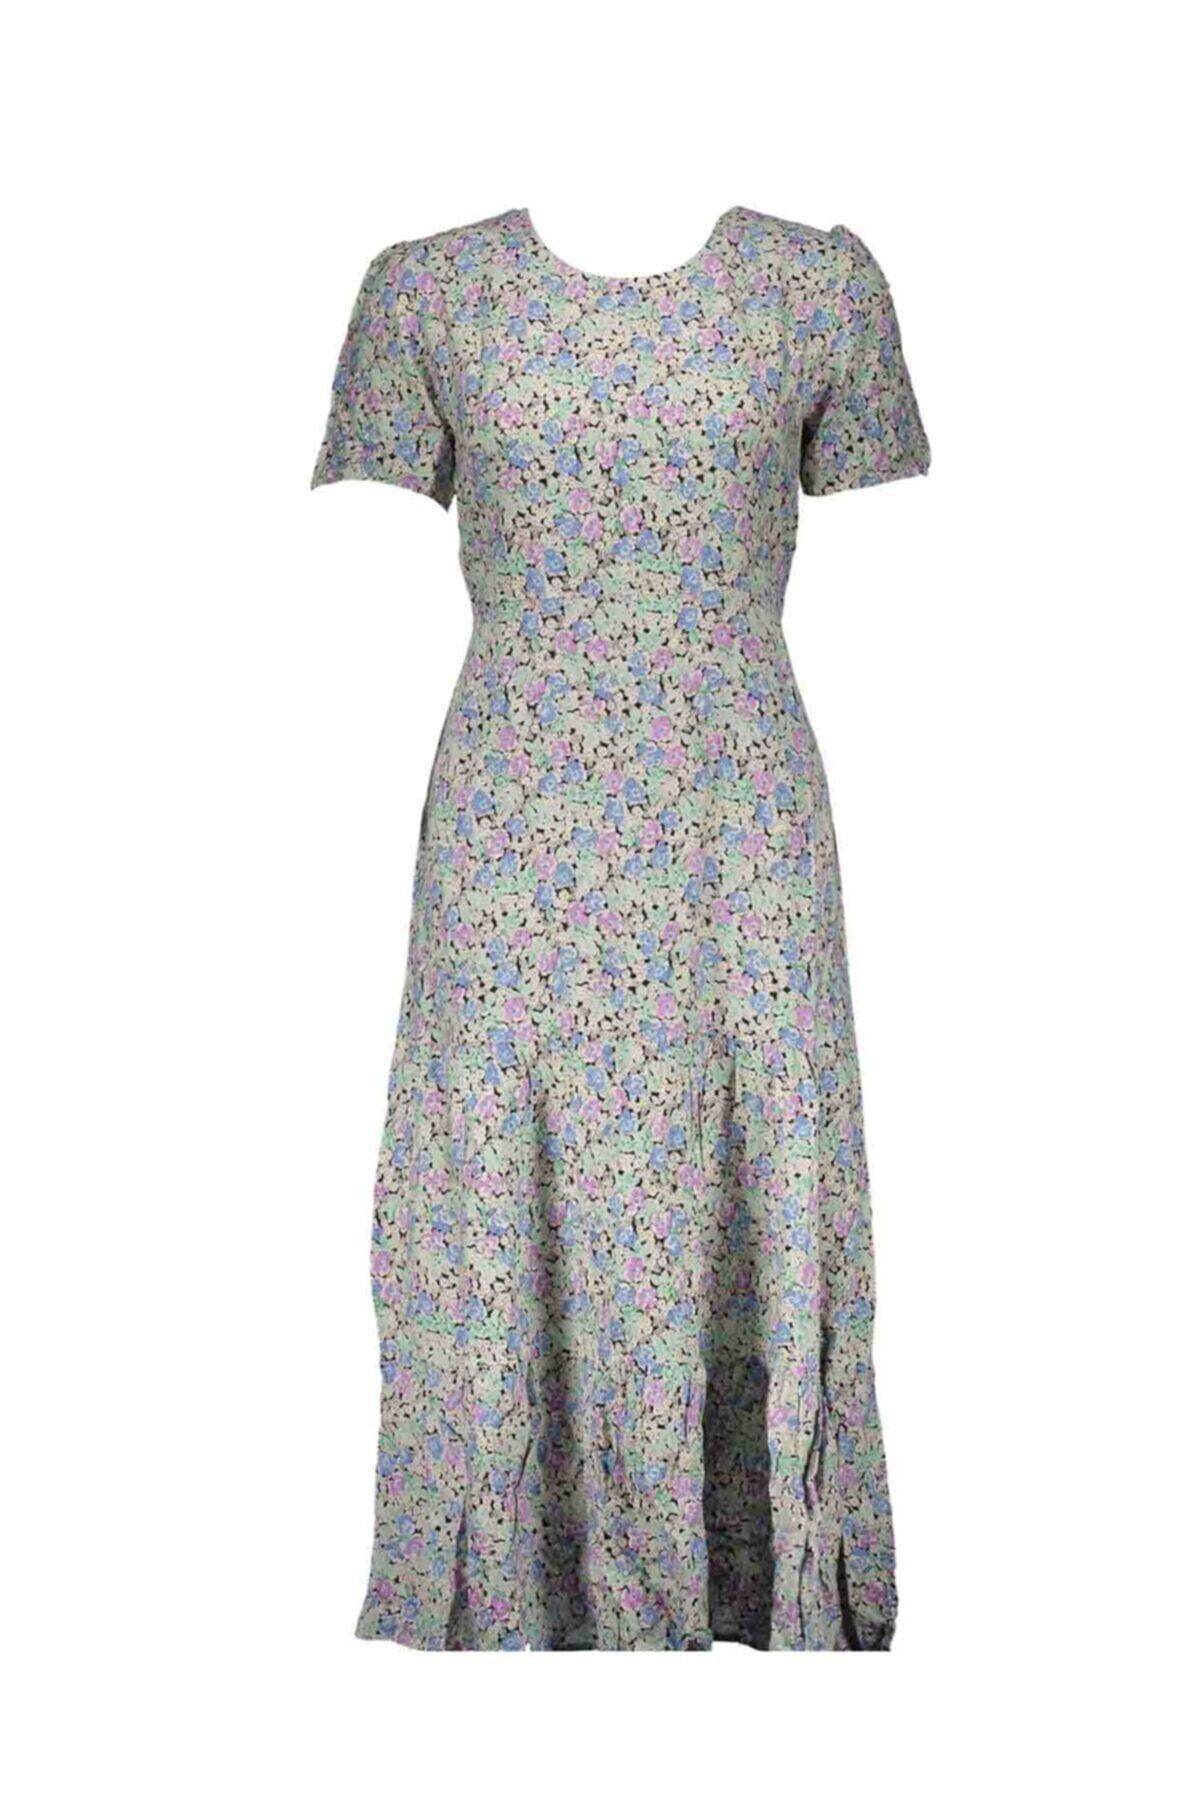 Collezione Lila Kadın Elbise 1